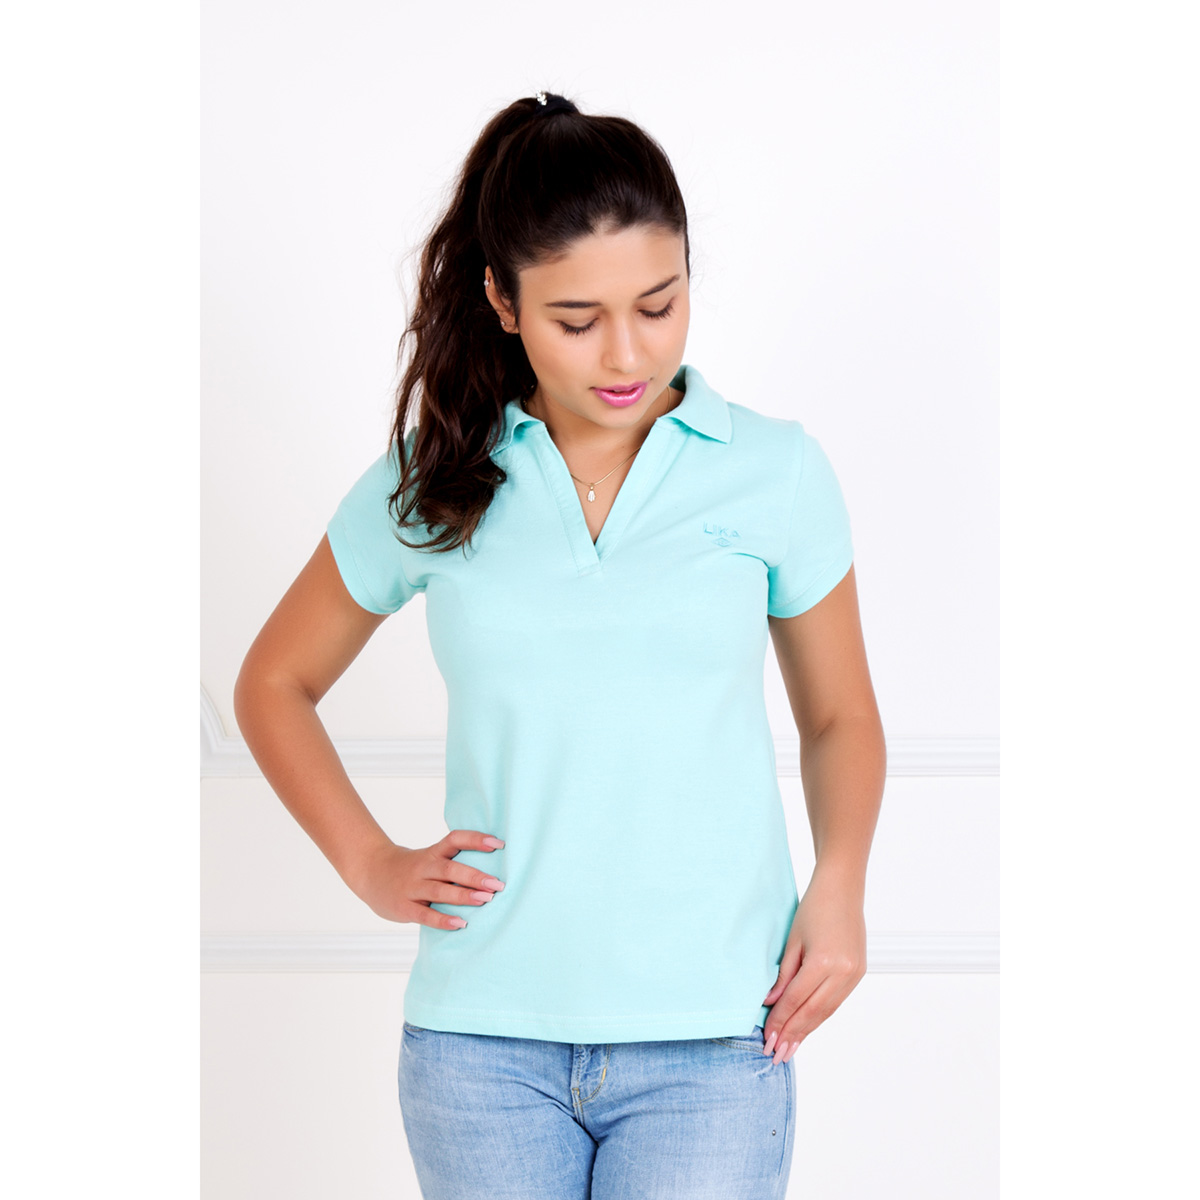 Женская футболка-поло Шерт Ментол, размер 40Блузки, майки, кофты<br>Обхват груди:80 см<br>Обхват талии:62 см<br>Обхват бедер:88 см<br>Рост:167 см<br><br>Тип: Жен. футболка<br>Размер: 40<br>Материал: Пике